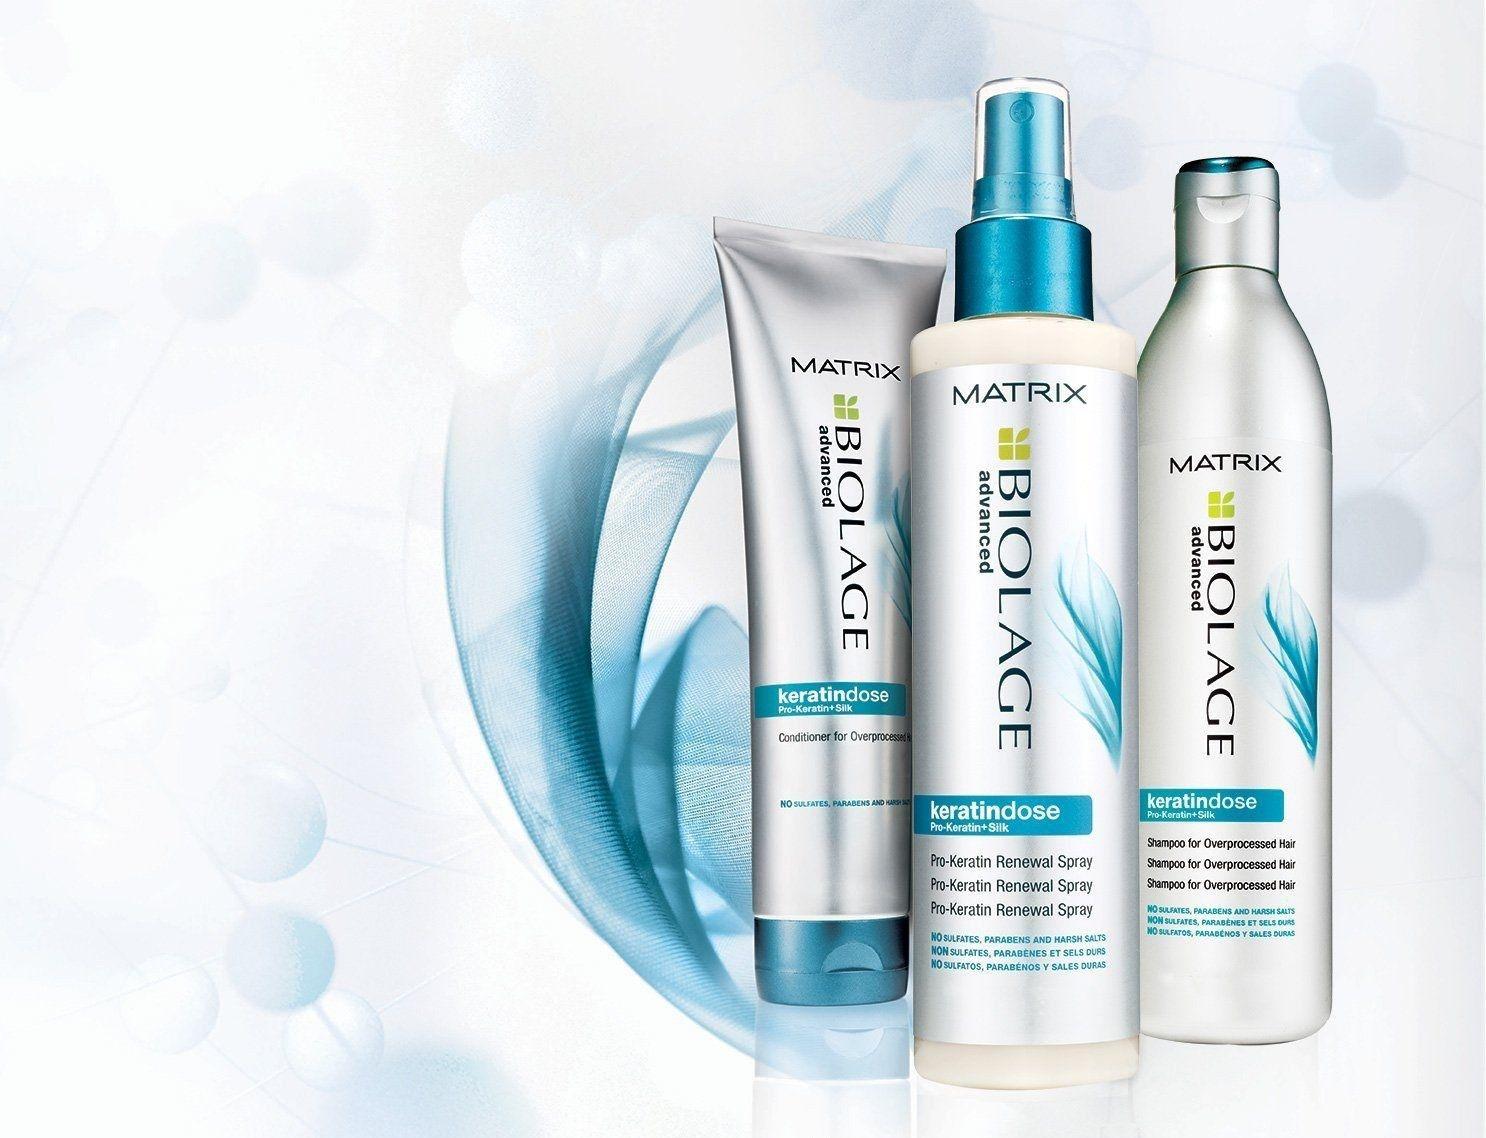 00ukrepljajushhij-shampun-dlja-povrezhdennyh-volos-matrix-biolage-keratindose-pro-keratin--77433-20131114140146_1